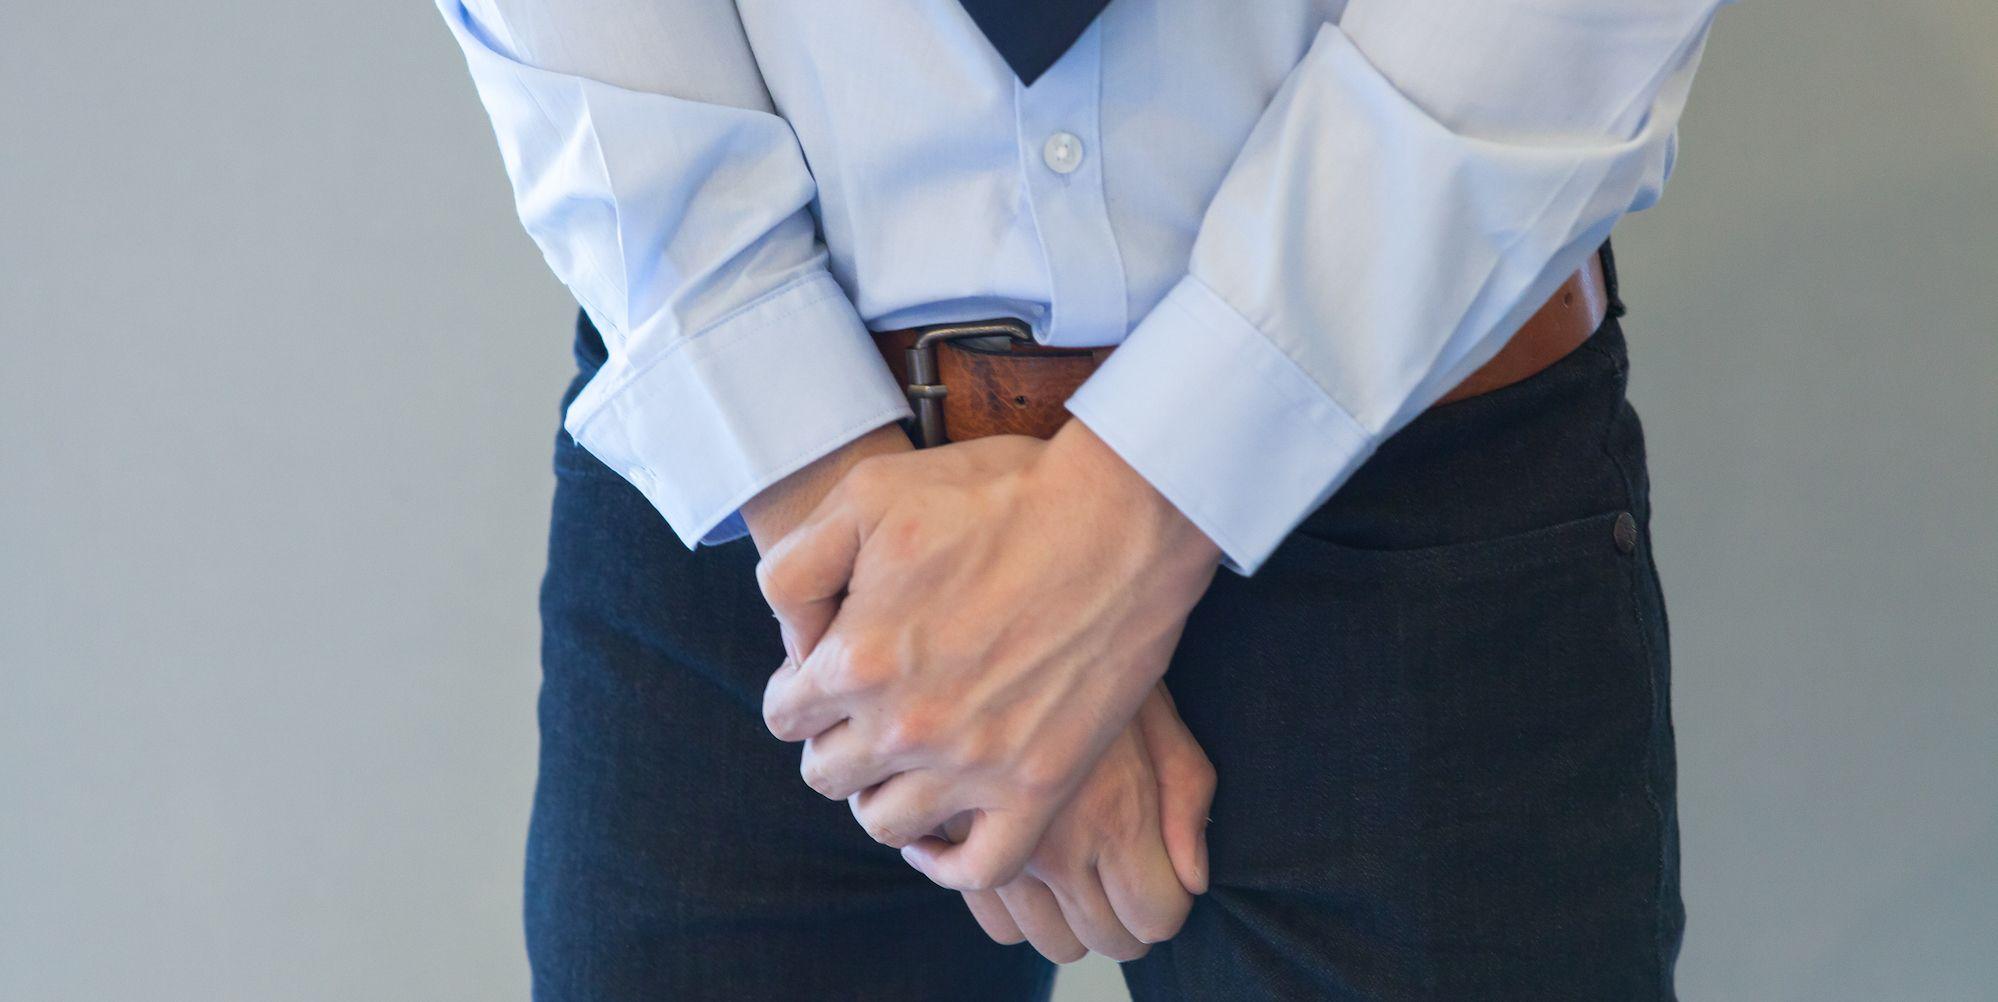 5 ways to prevent jock itch